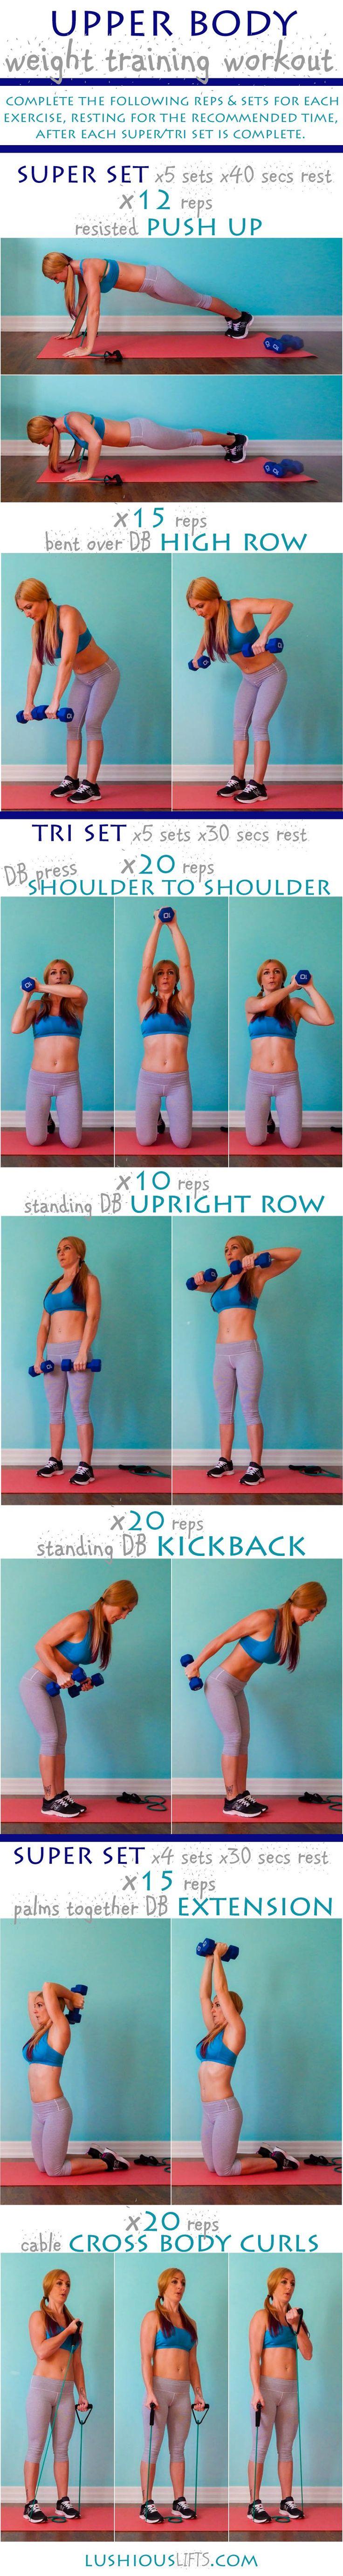 Upper Body Weight Training Workout    lushiousLIFTS.com